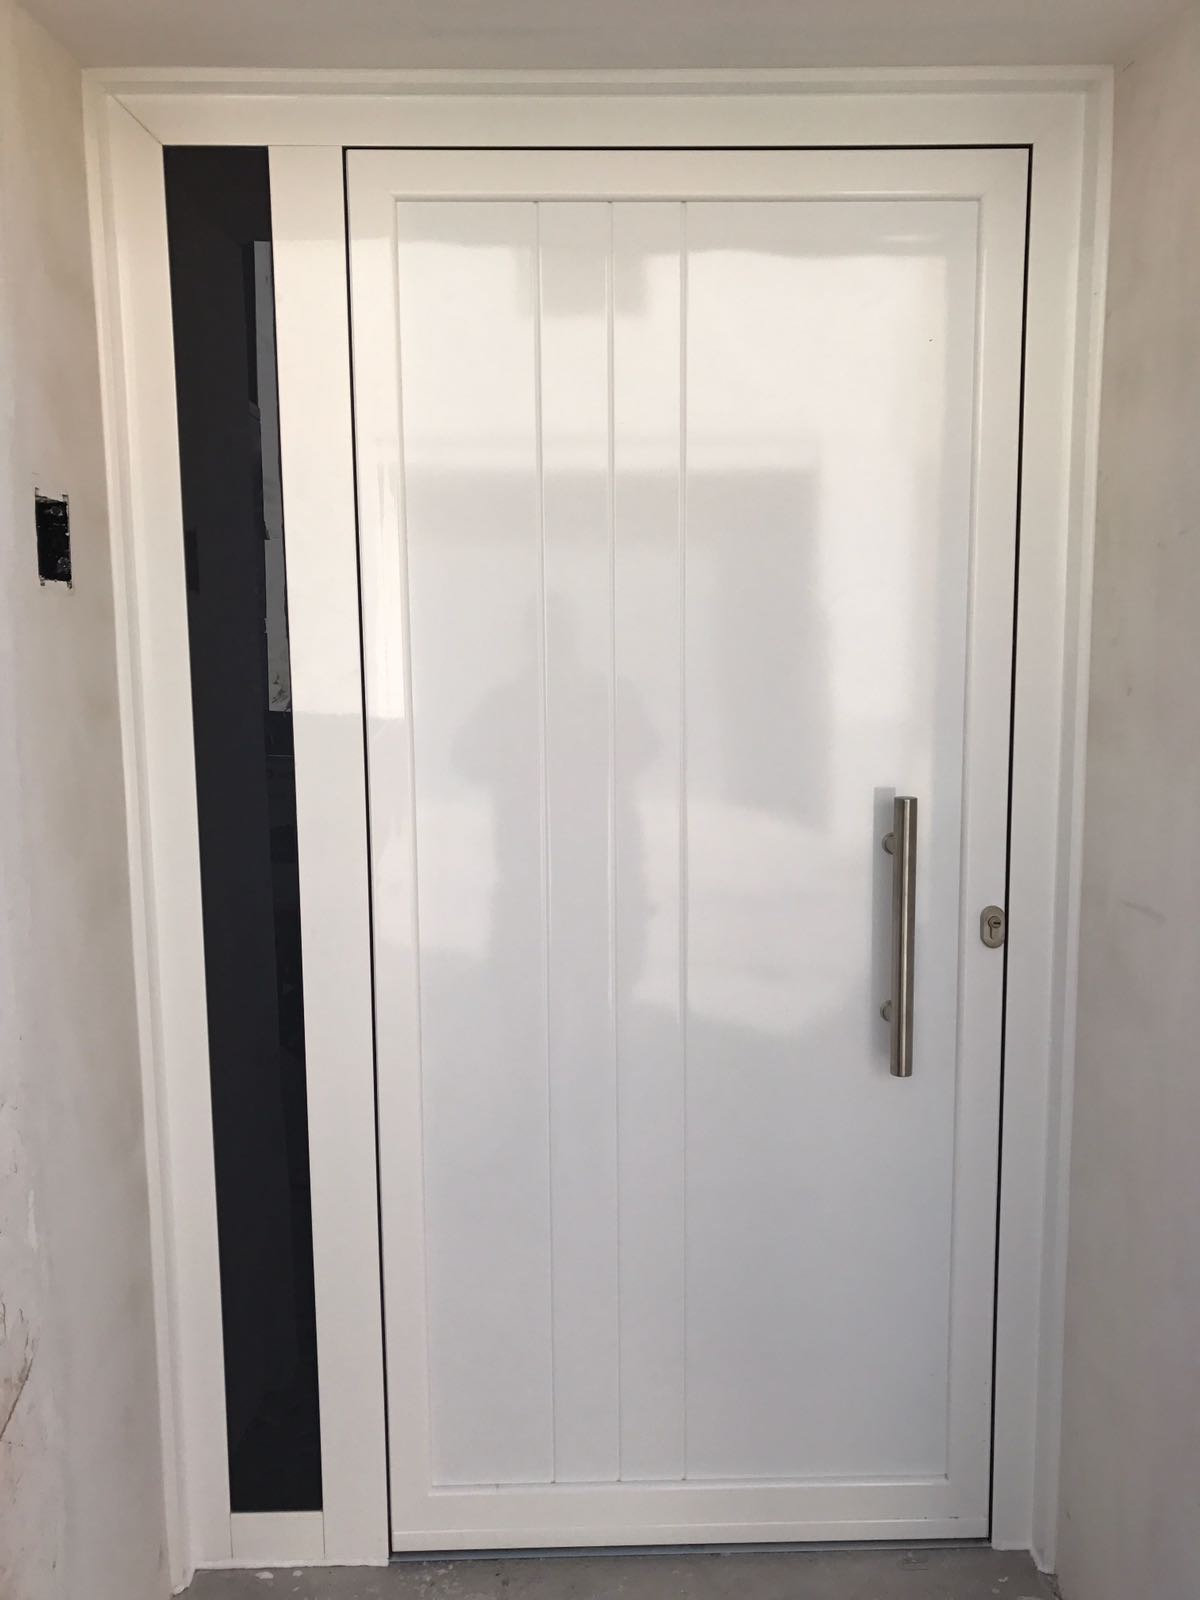 Puertas De Aluminio En Zaragoza Comprar Puertas De Aluminio